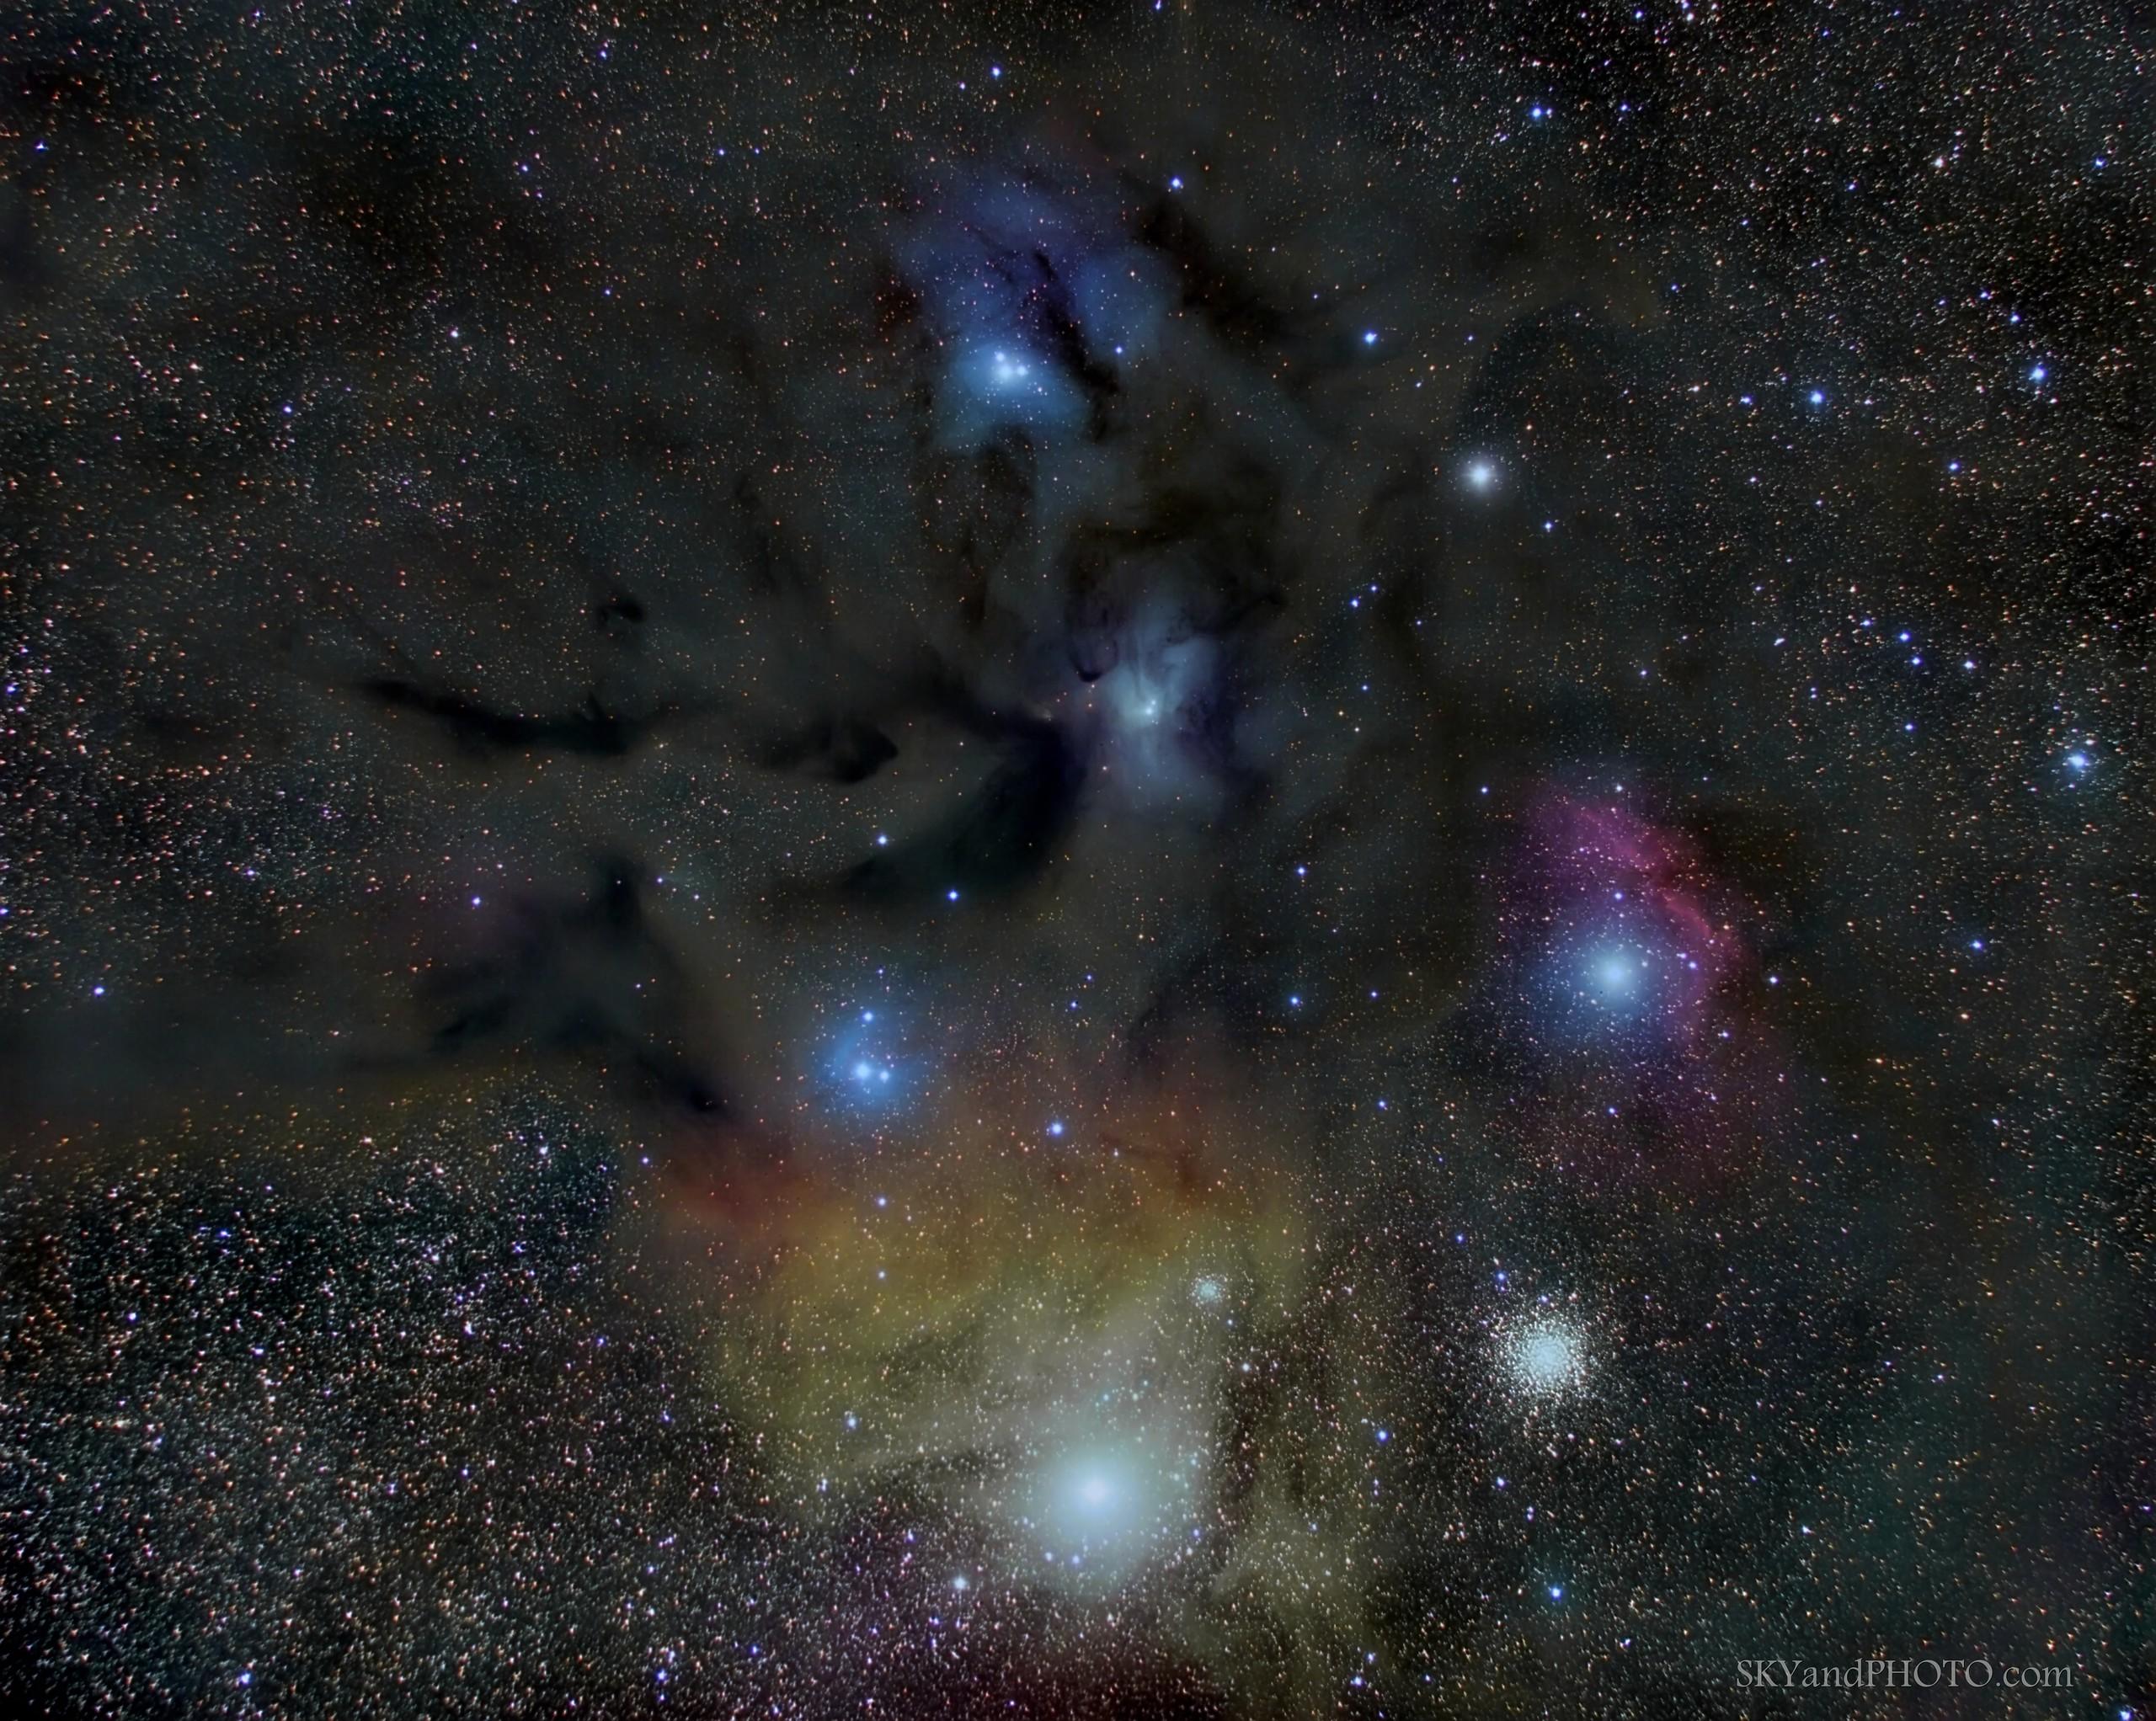 "RHO OPHIUCHI CLOUD COMPLEX 16 Jun 2018, Sierra Seville, Spain. Telescope  Takahashi FS60 CB. Reducer Takahashi x72. 255mm at F4,3 Mount Takahashi EM200 Temma2. Camera  CCD QHY 16200A-FW7. Guided with QHY OAG with CCD  QHY5 LII. Filtros  L, R, G, B , of  2"" Astronomik. Exposures 7x600`  L , 8x300`,  R,G,B bin 2."